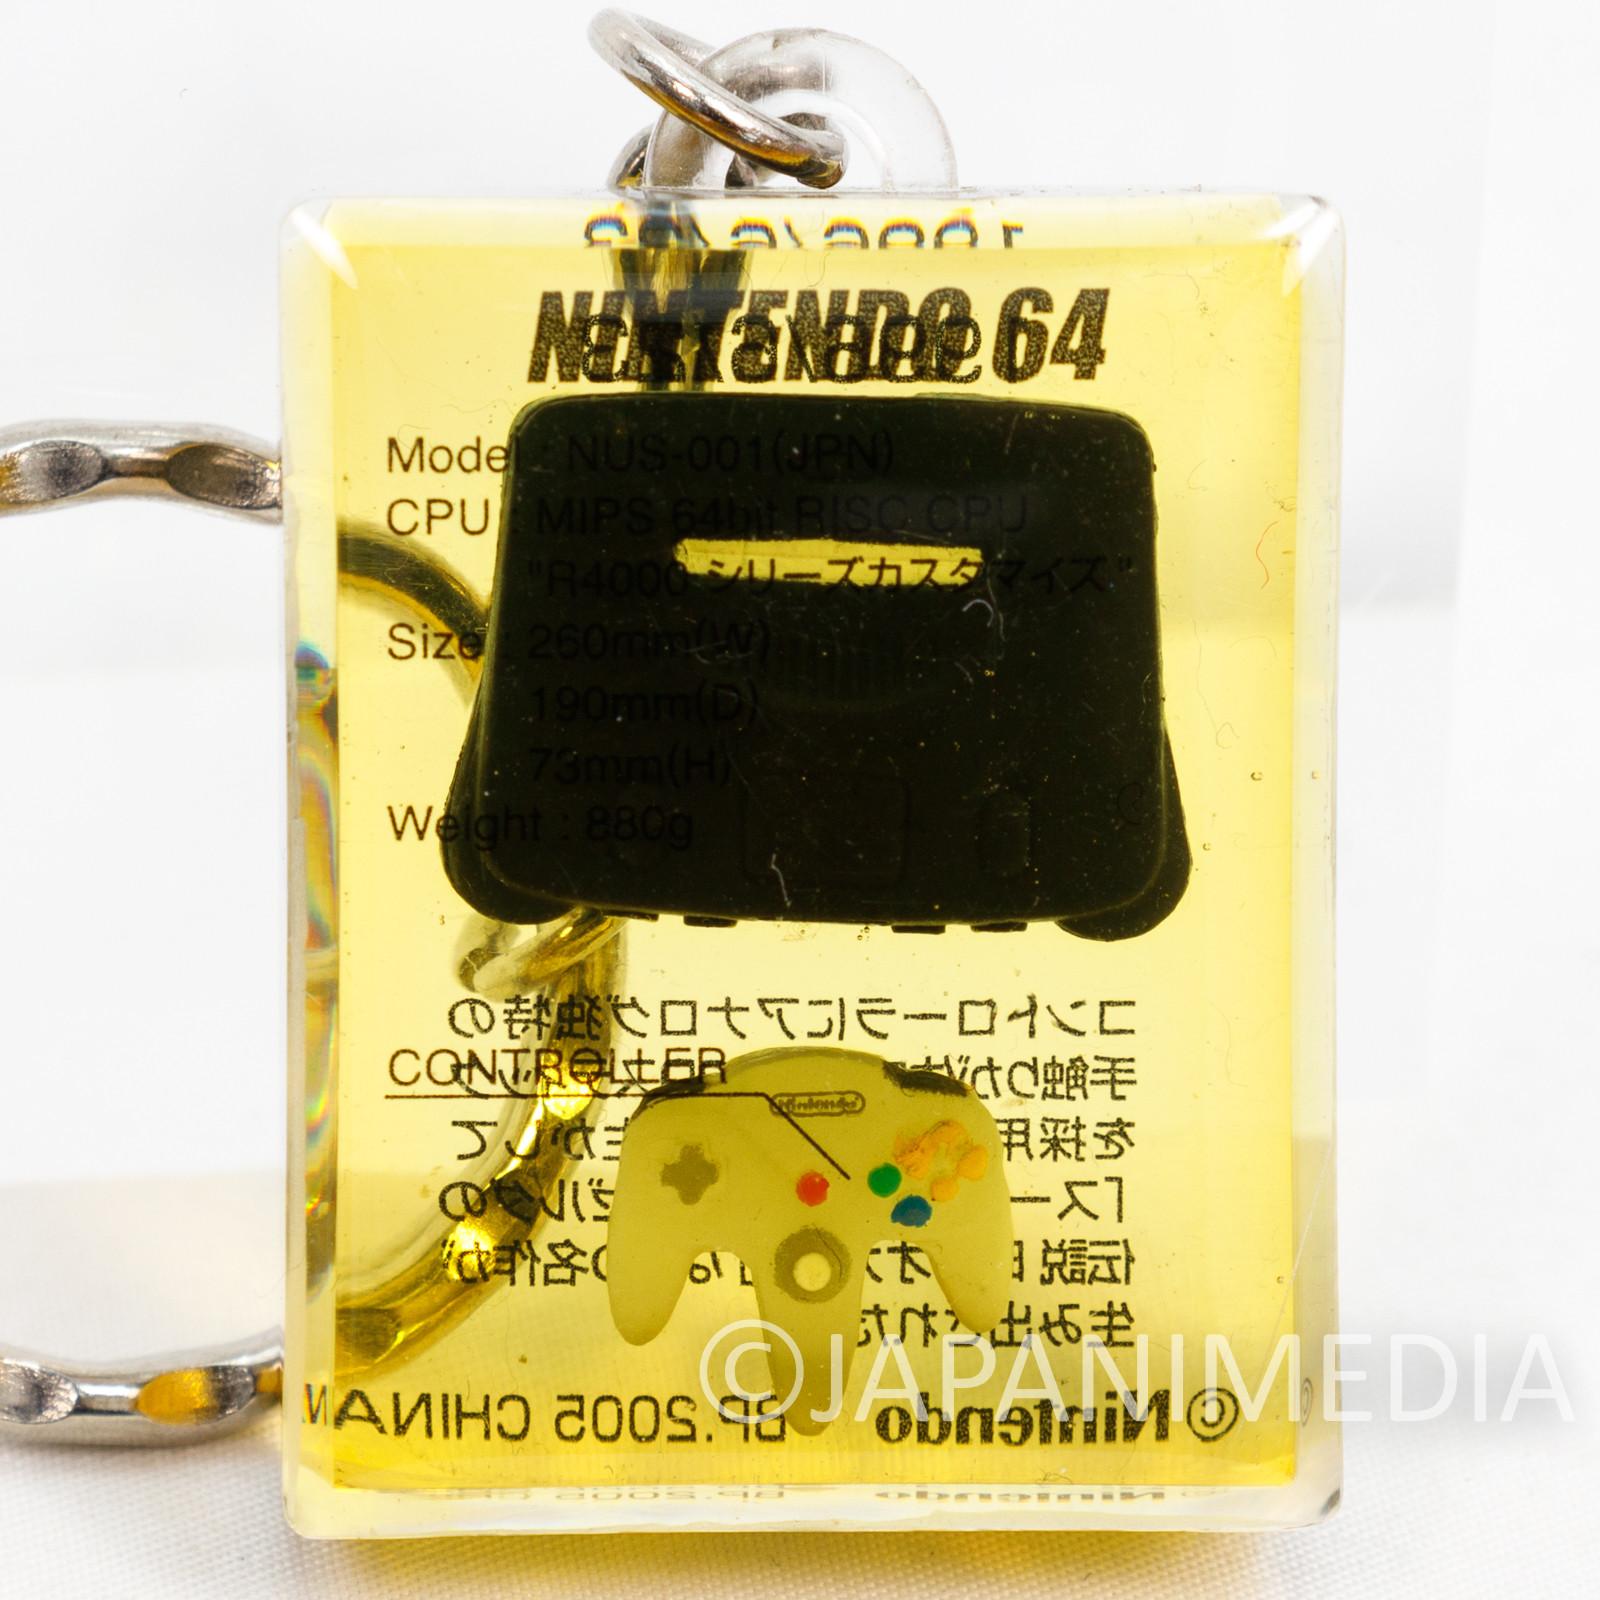 Nintendo Game Console History Miniature Figure Key Chain Nintendo 64 JAPAN3